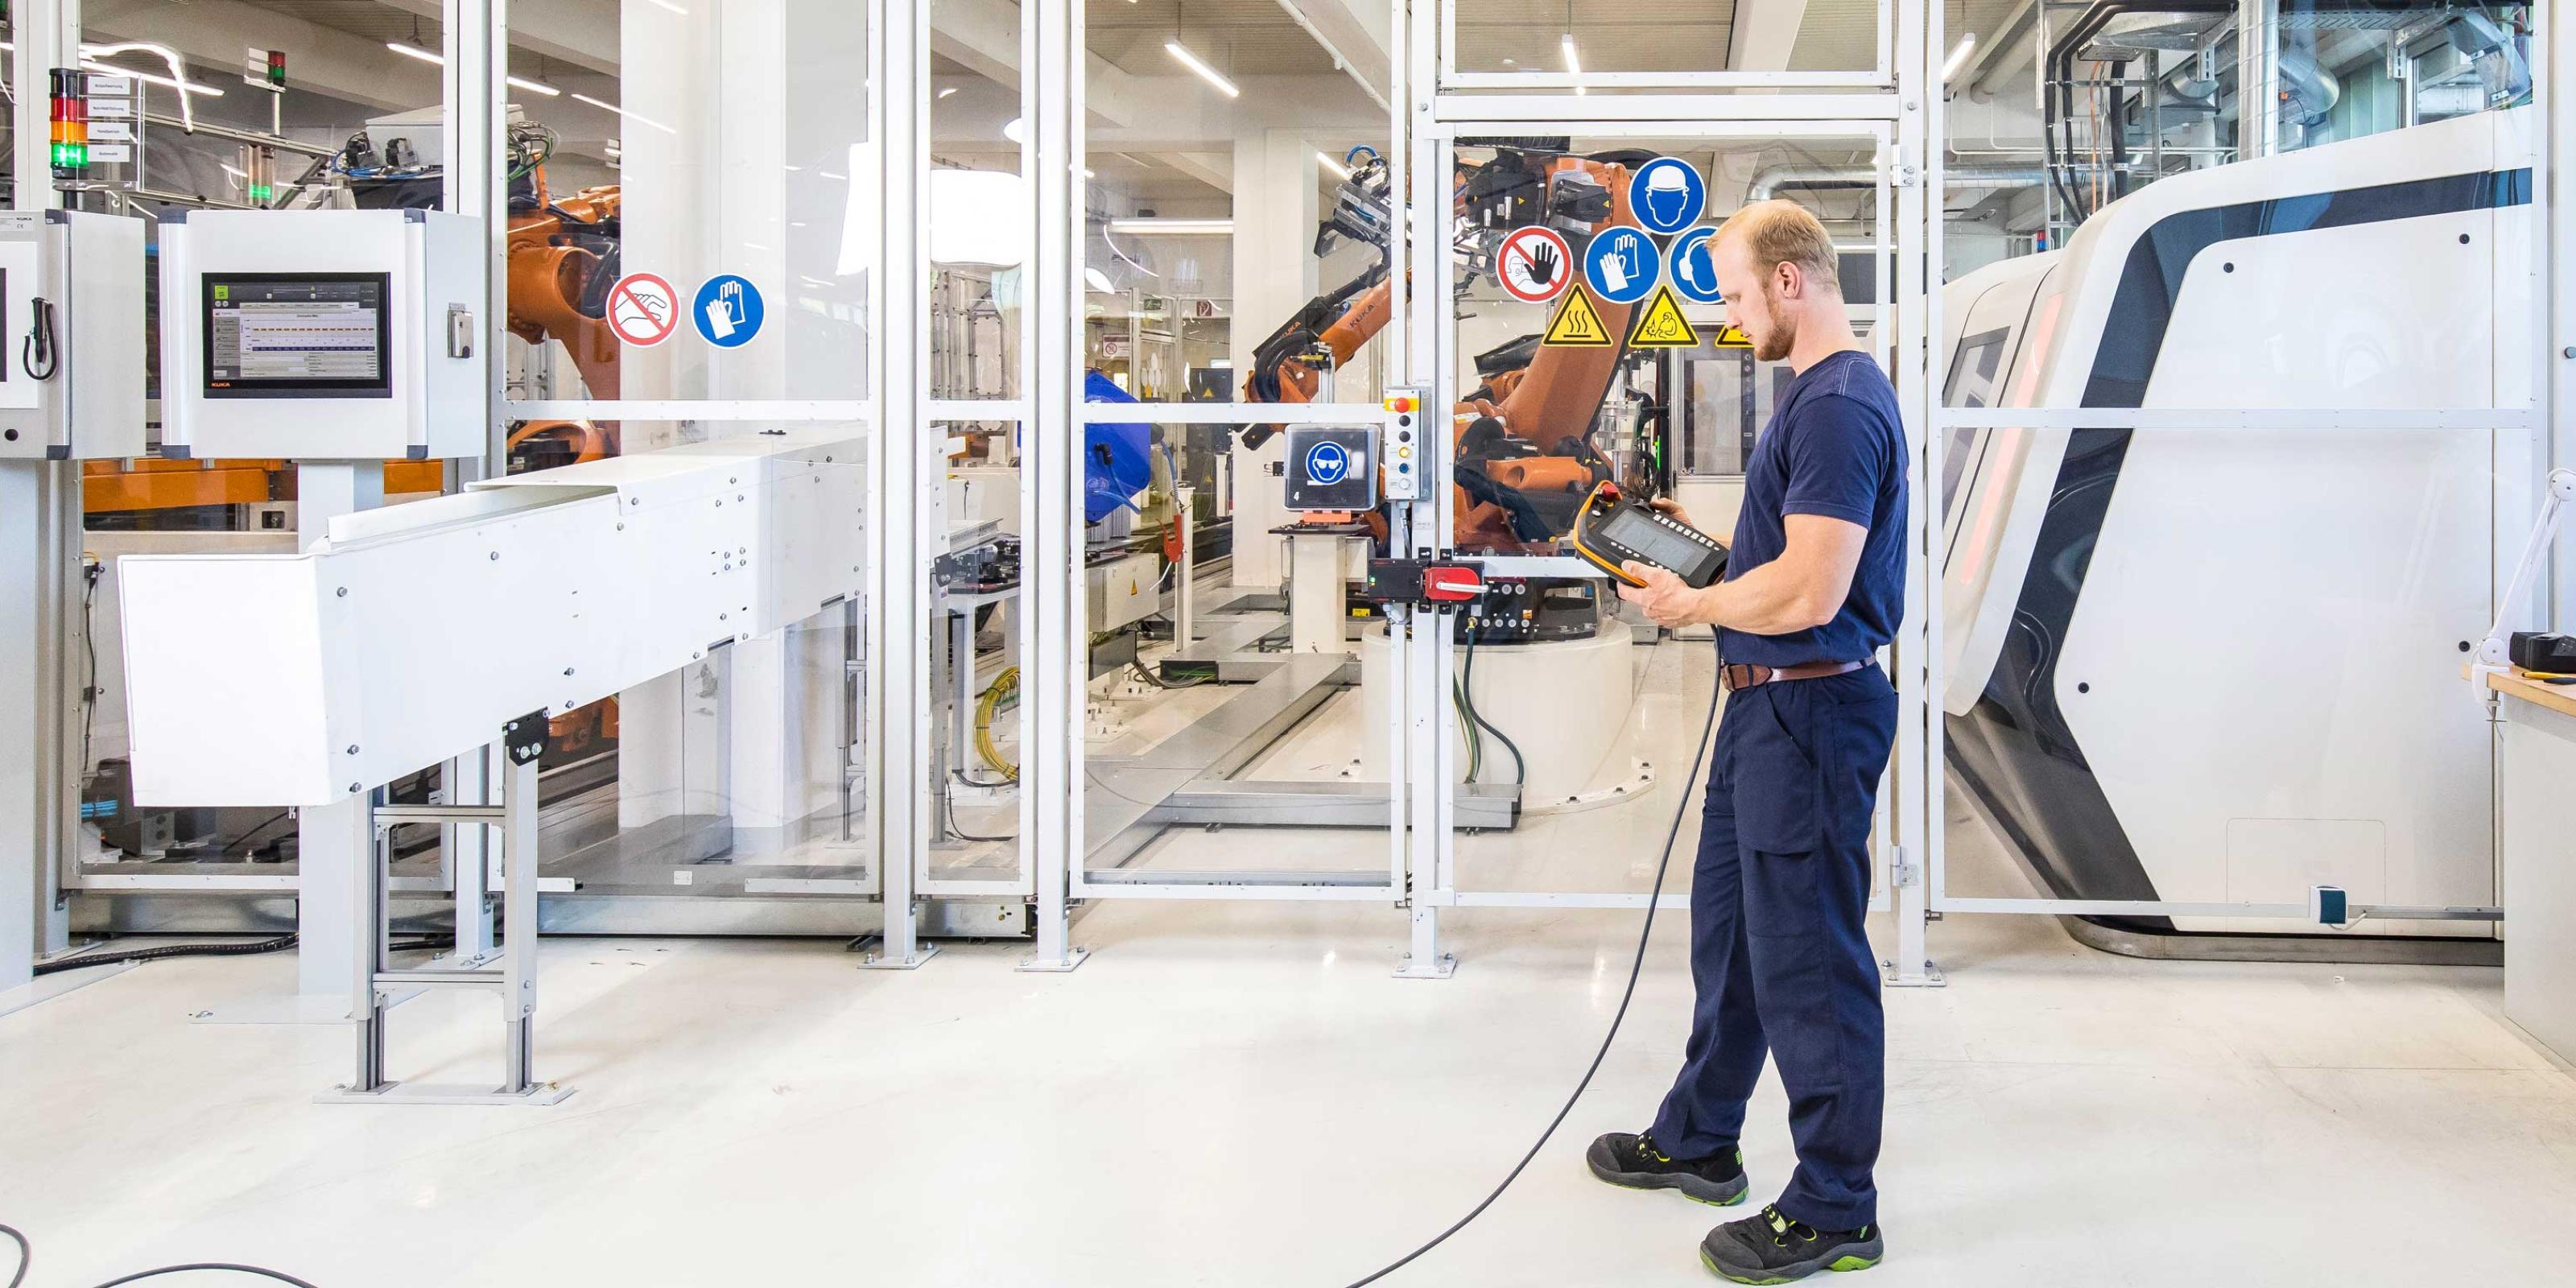 Truma employee operates Kuka robot